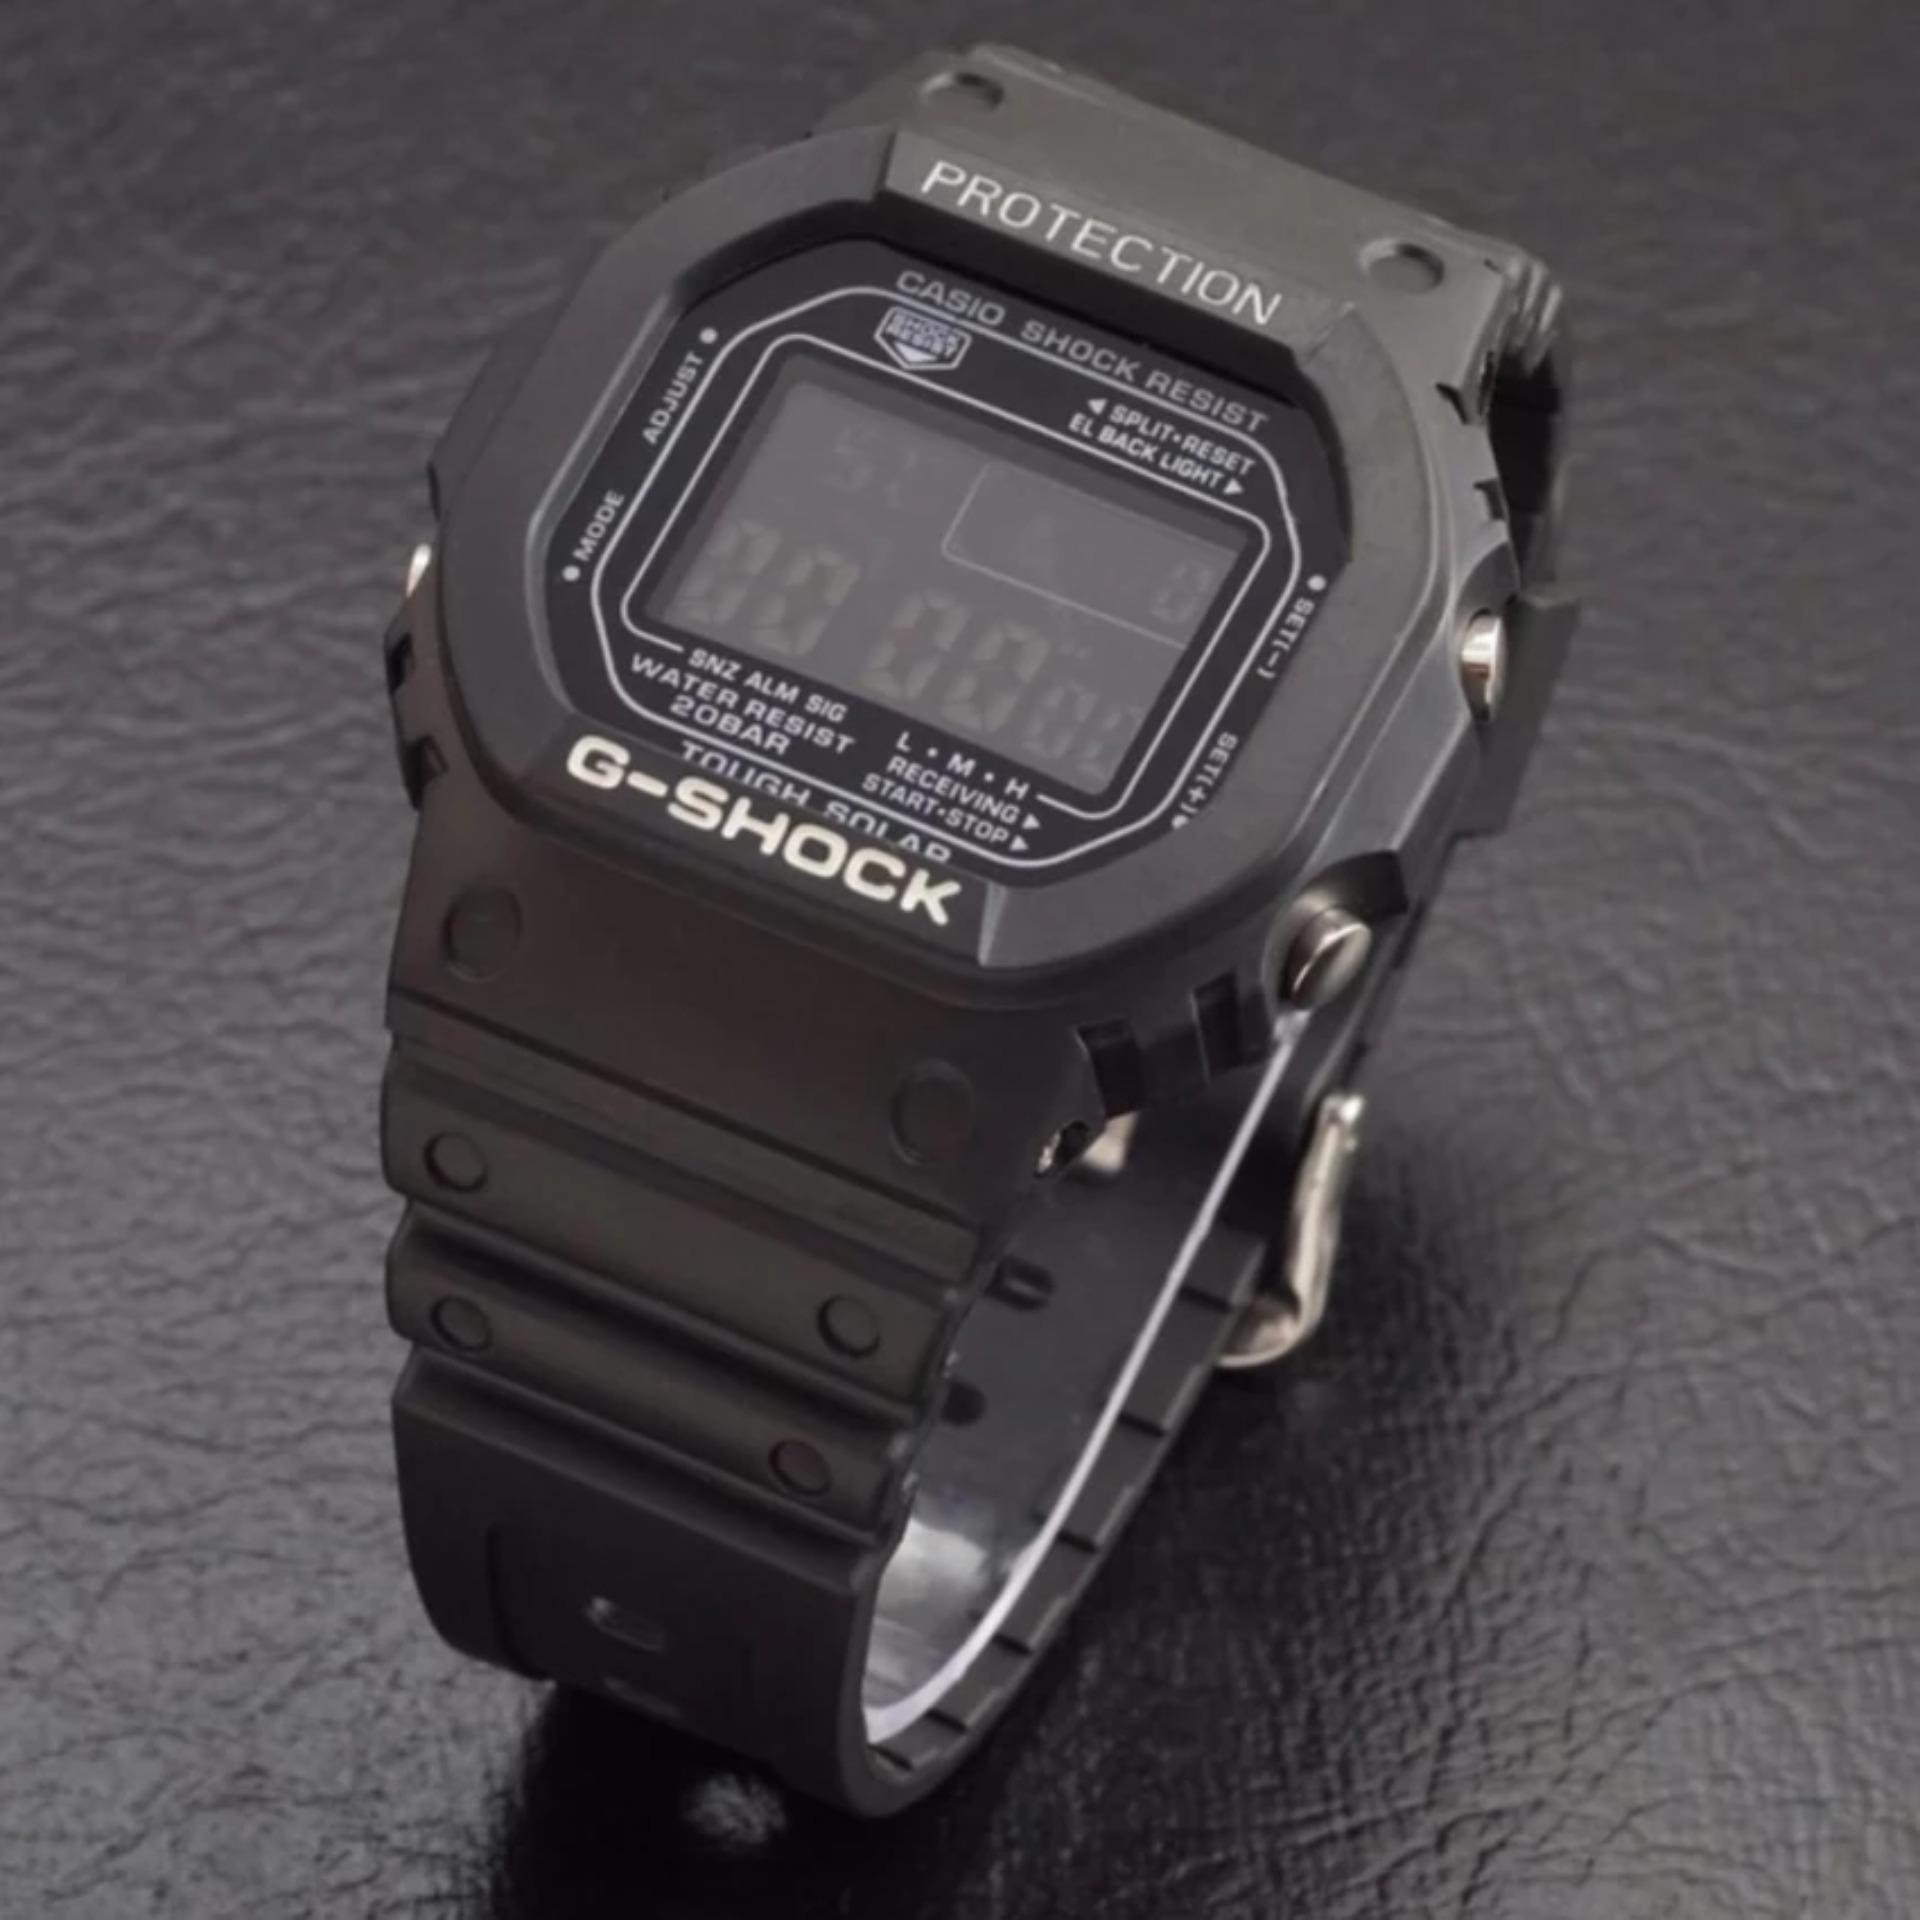 Casio Calculator Jam Tangan Pria Hitam Strap Karet Dbc 32 1a Beside Bem 109d 1avdf Stainless Steel Black Fashion